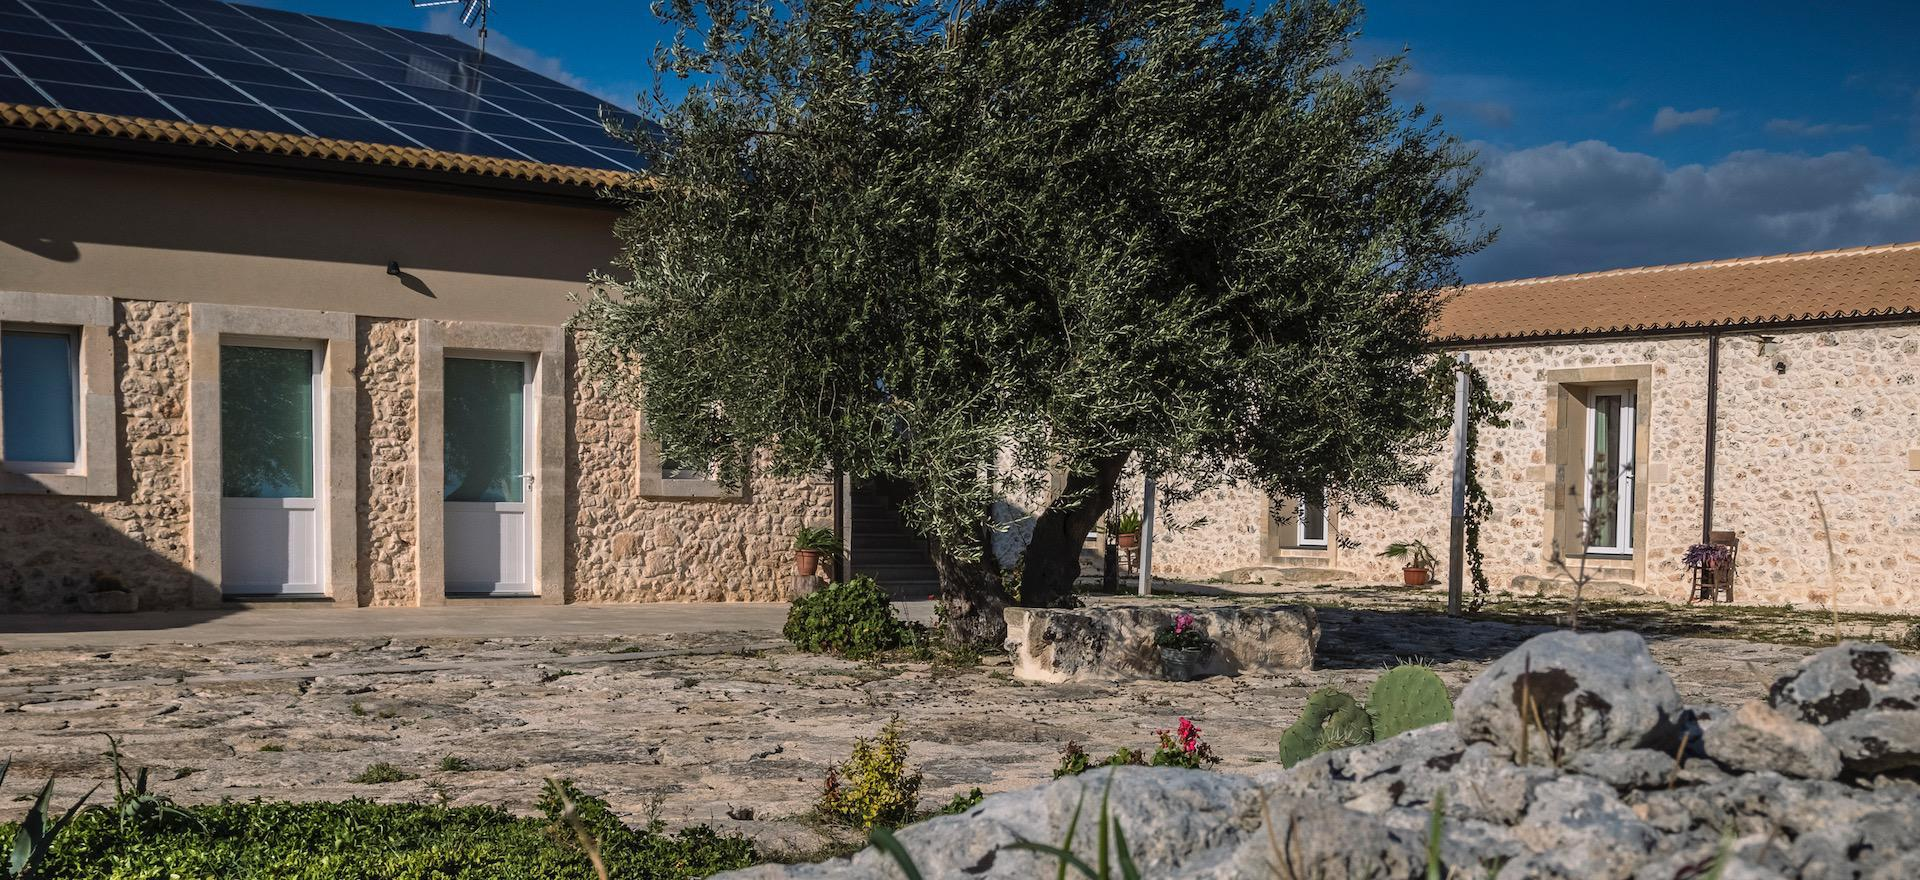 Agriturismo op het Siciliaanse platteland